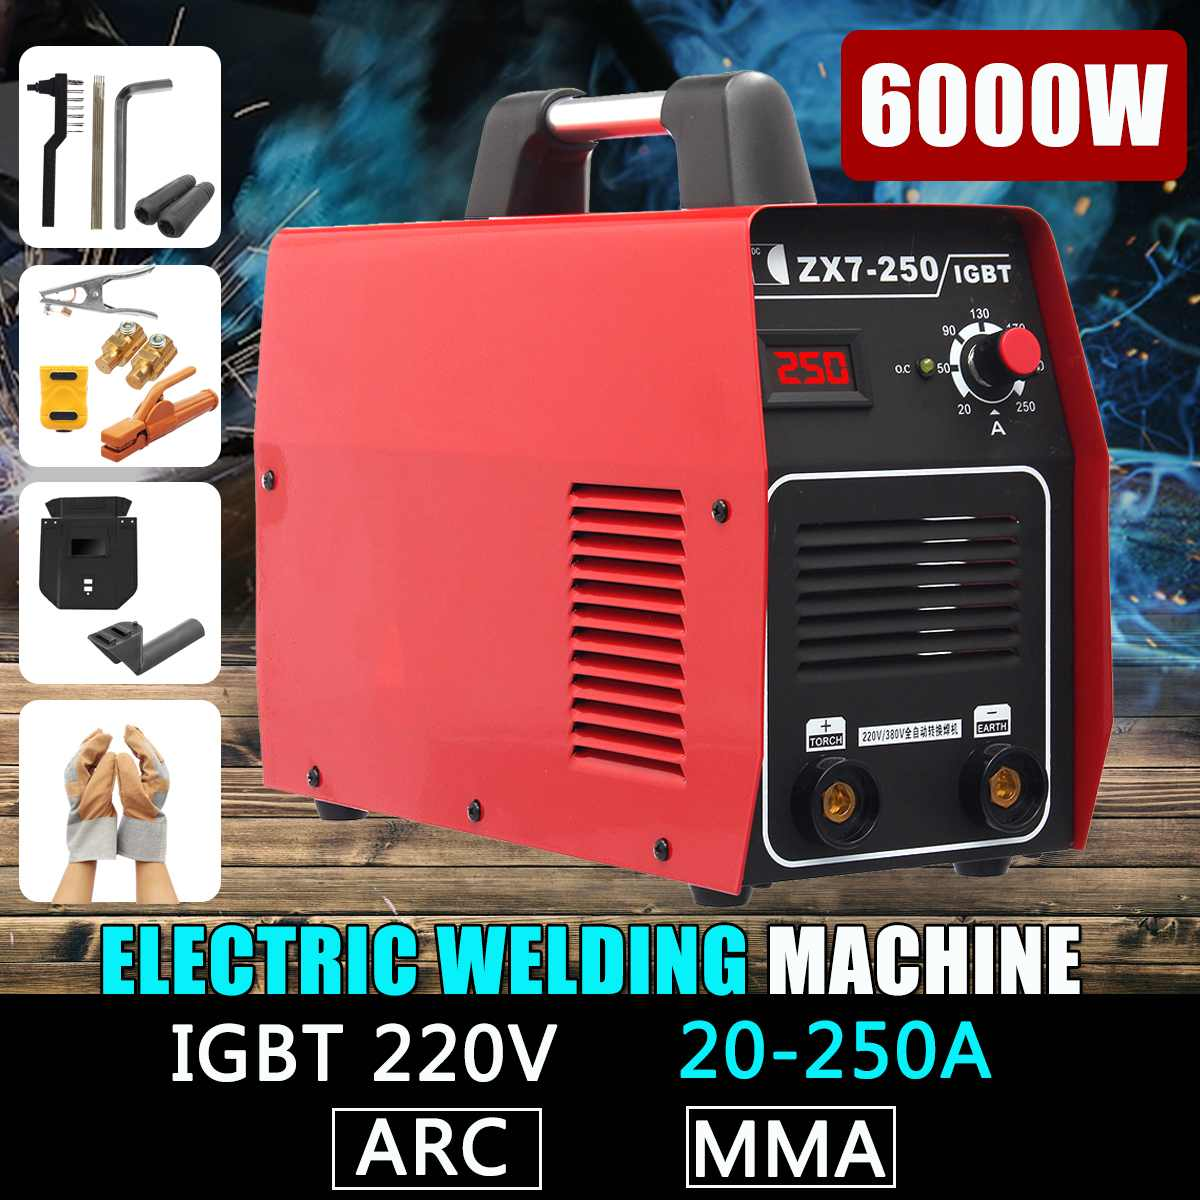 250A 220V MMA ARC Digital Electric Welding Machine DC IGBT Inverter Stick Welder